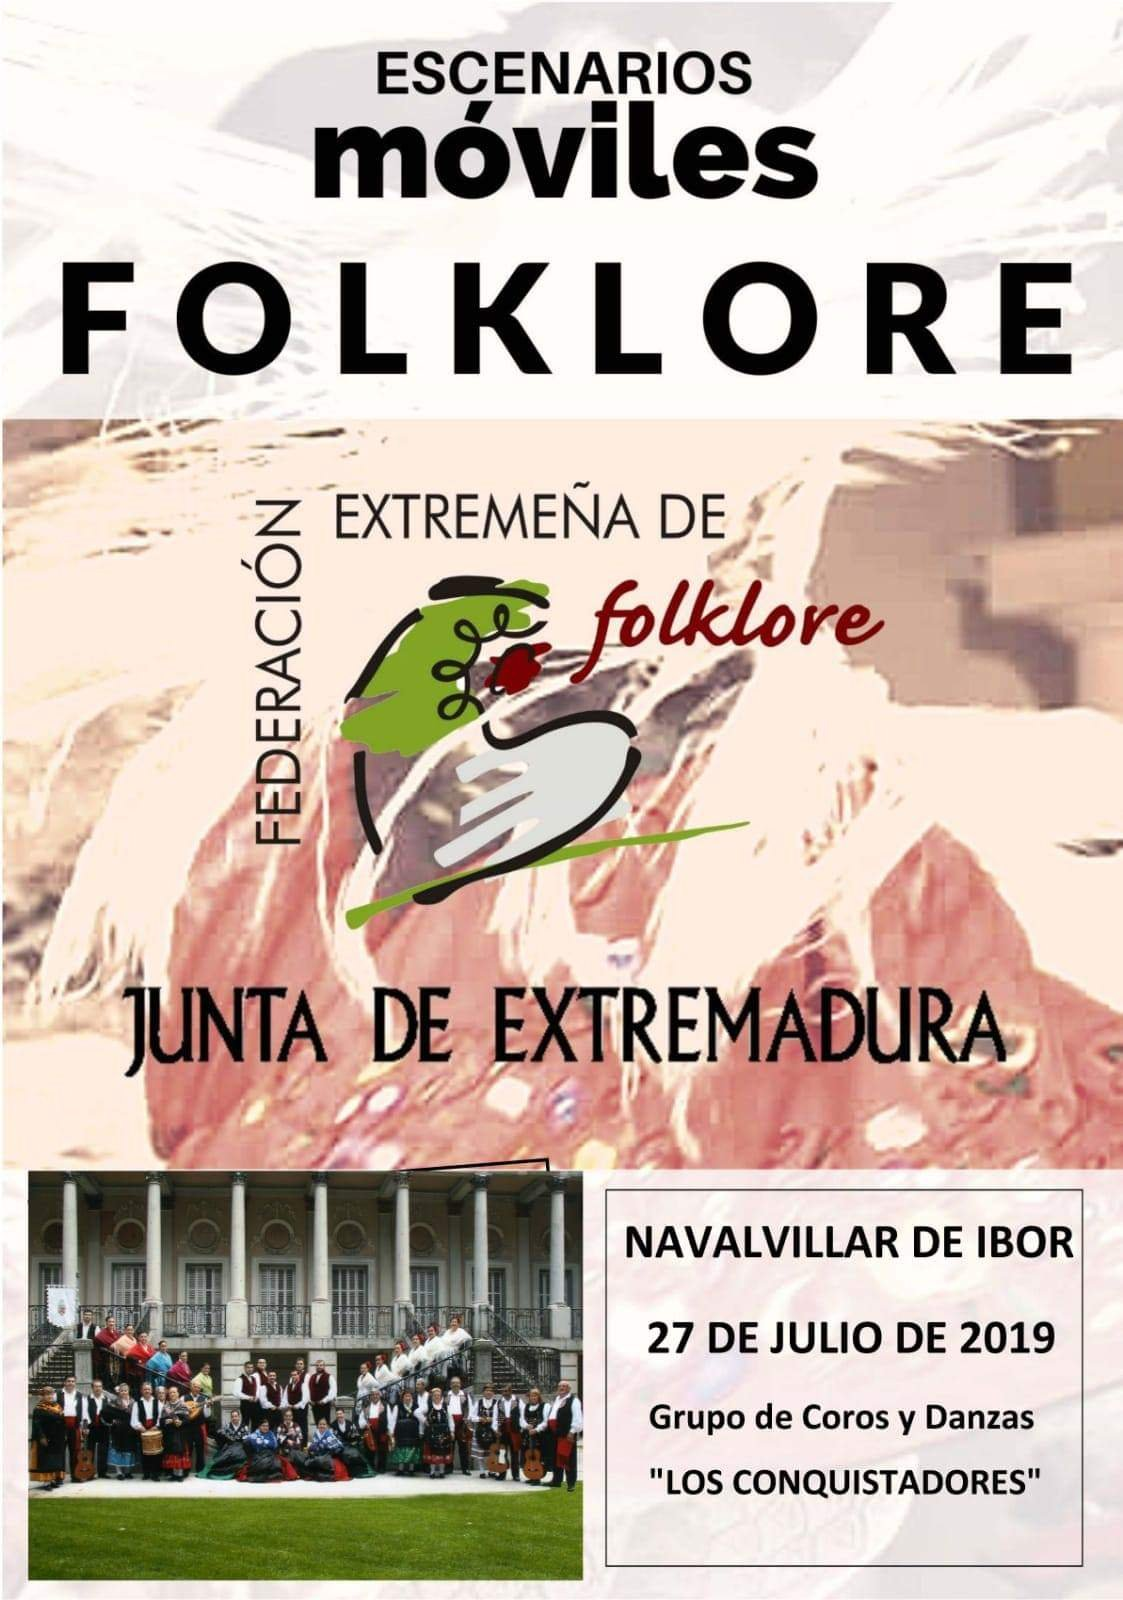 Escenarios móviles folklore 2019 - Navalvillar de Ibor (Cáceres)